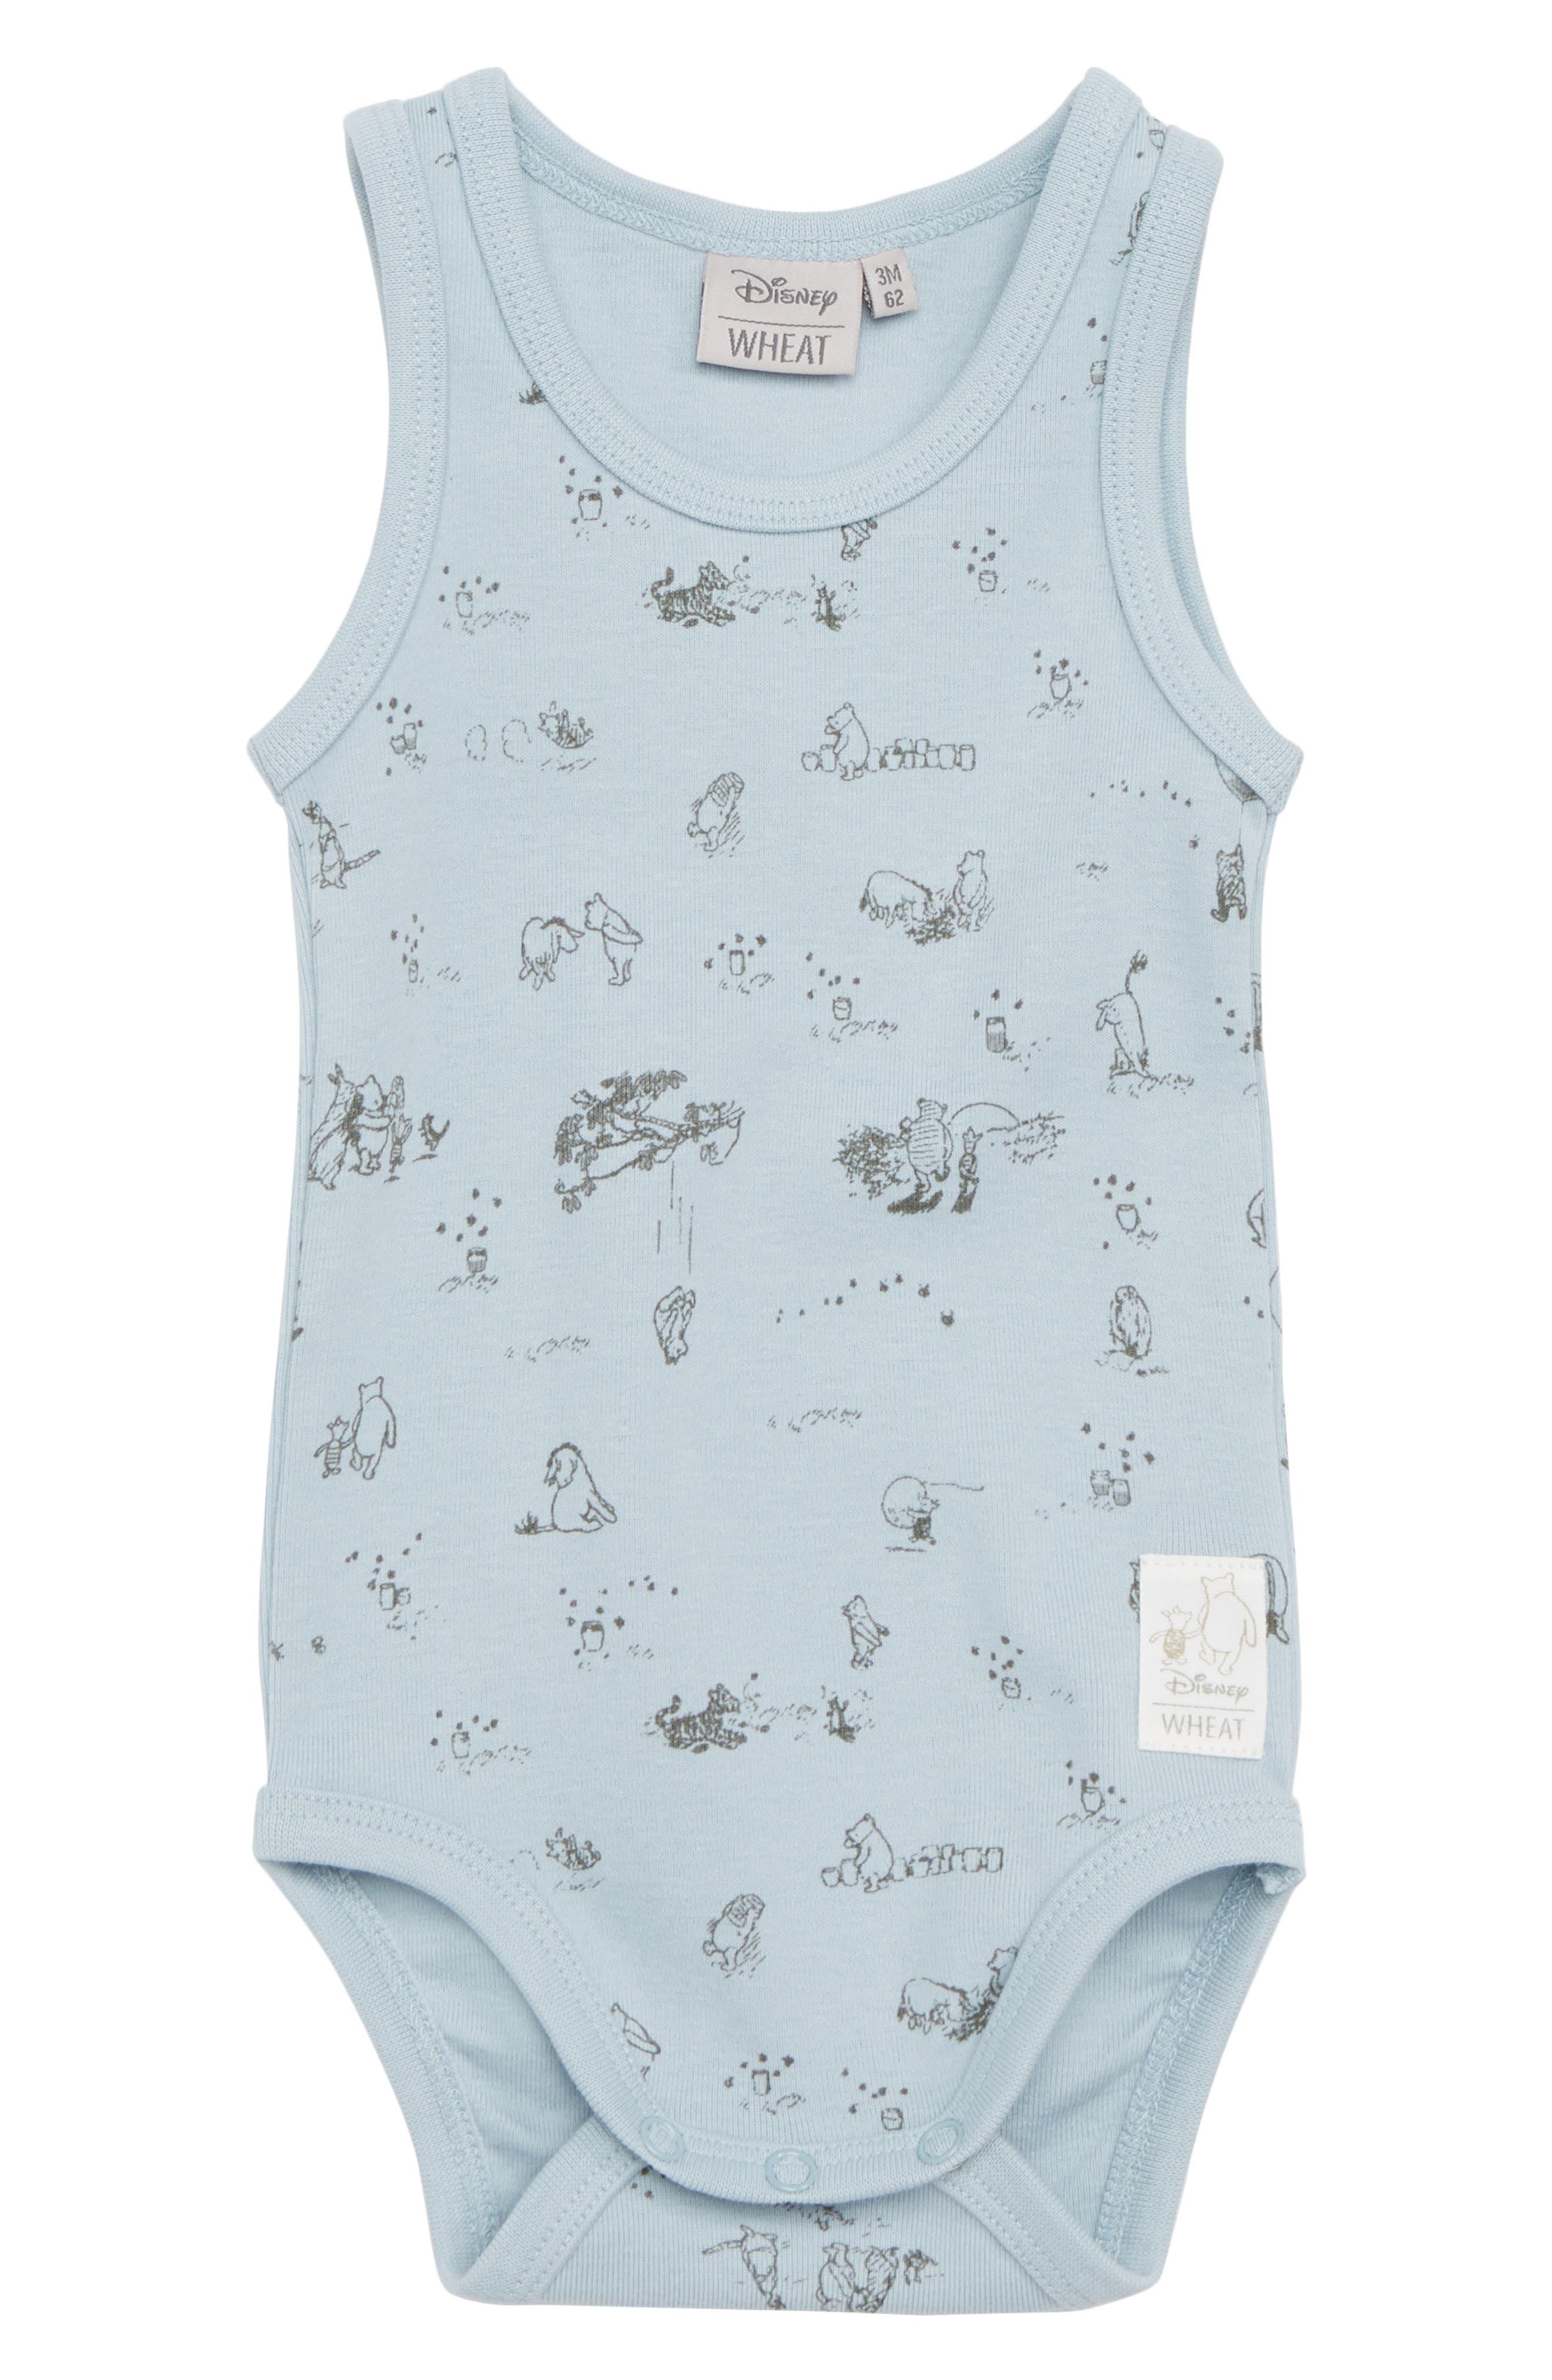 x Disney<sup>®</sup> Winnie the Pooh Organic Cotton Bodysuit,                         Main,                         color, Sky